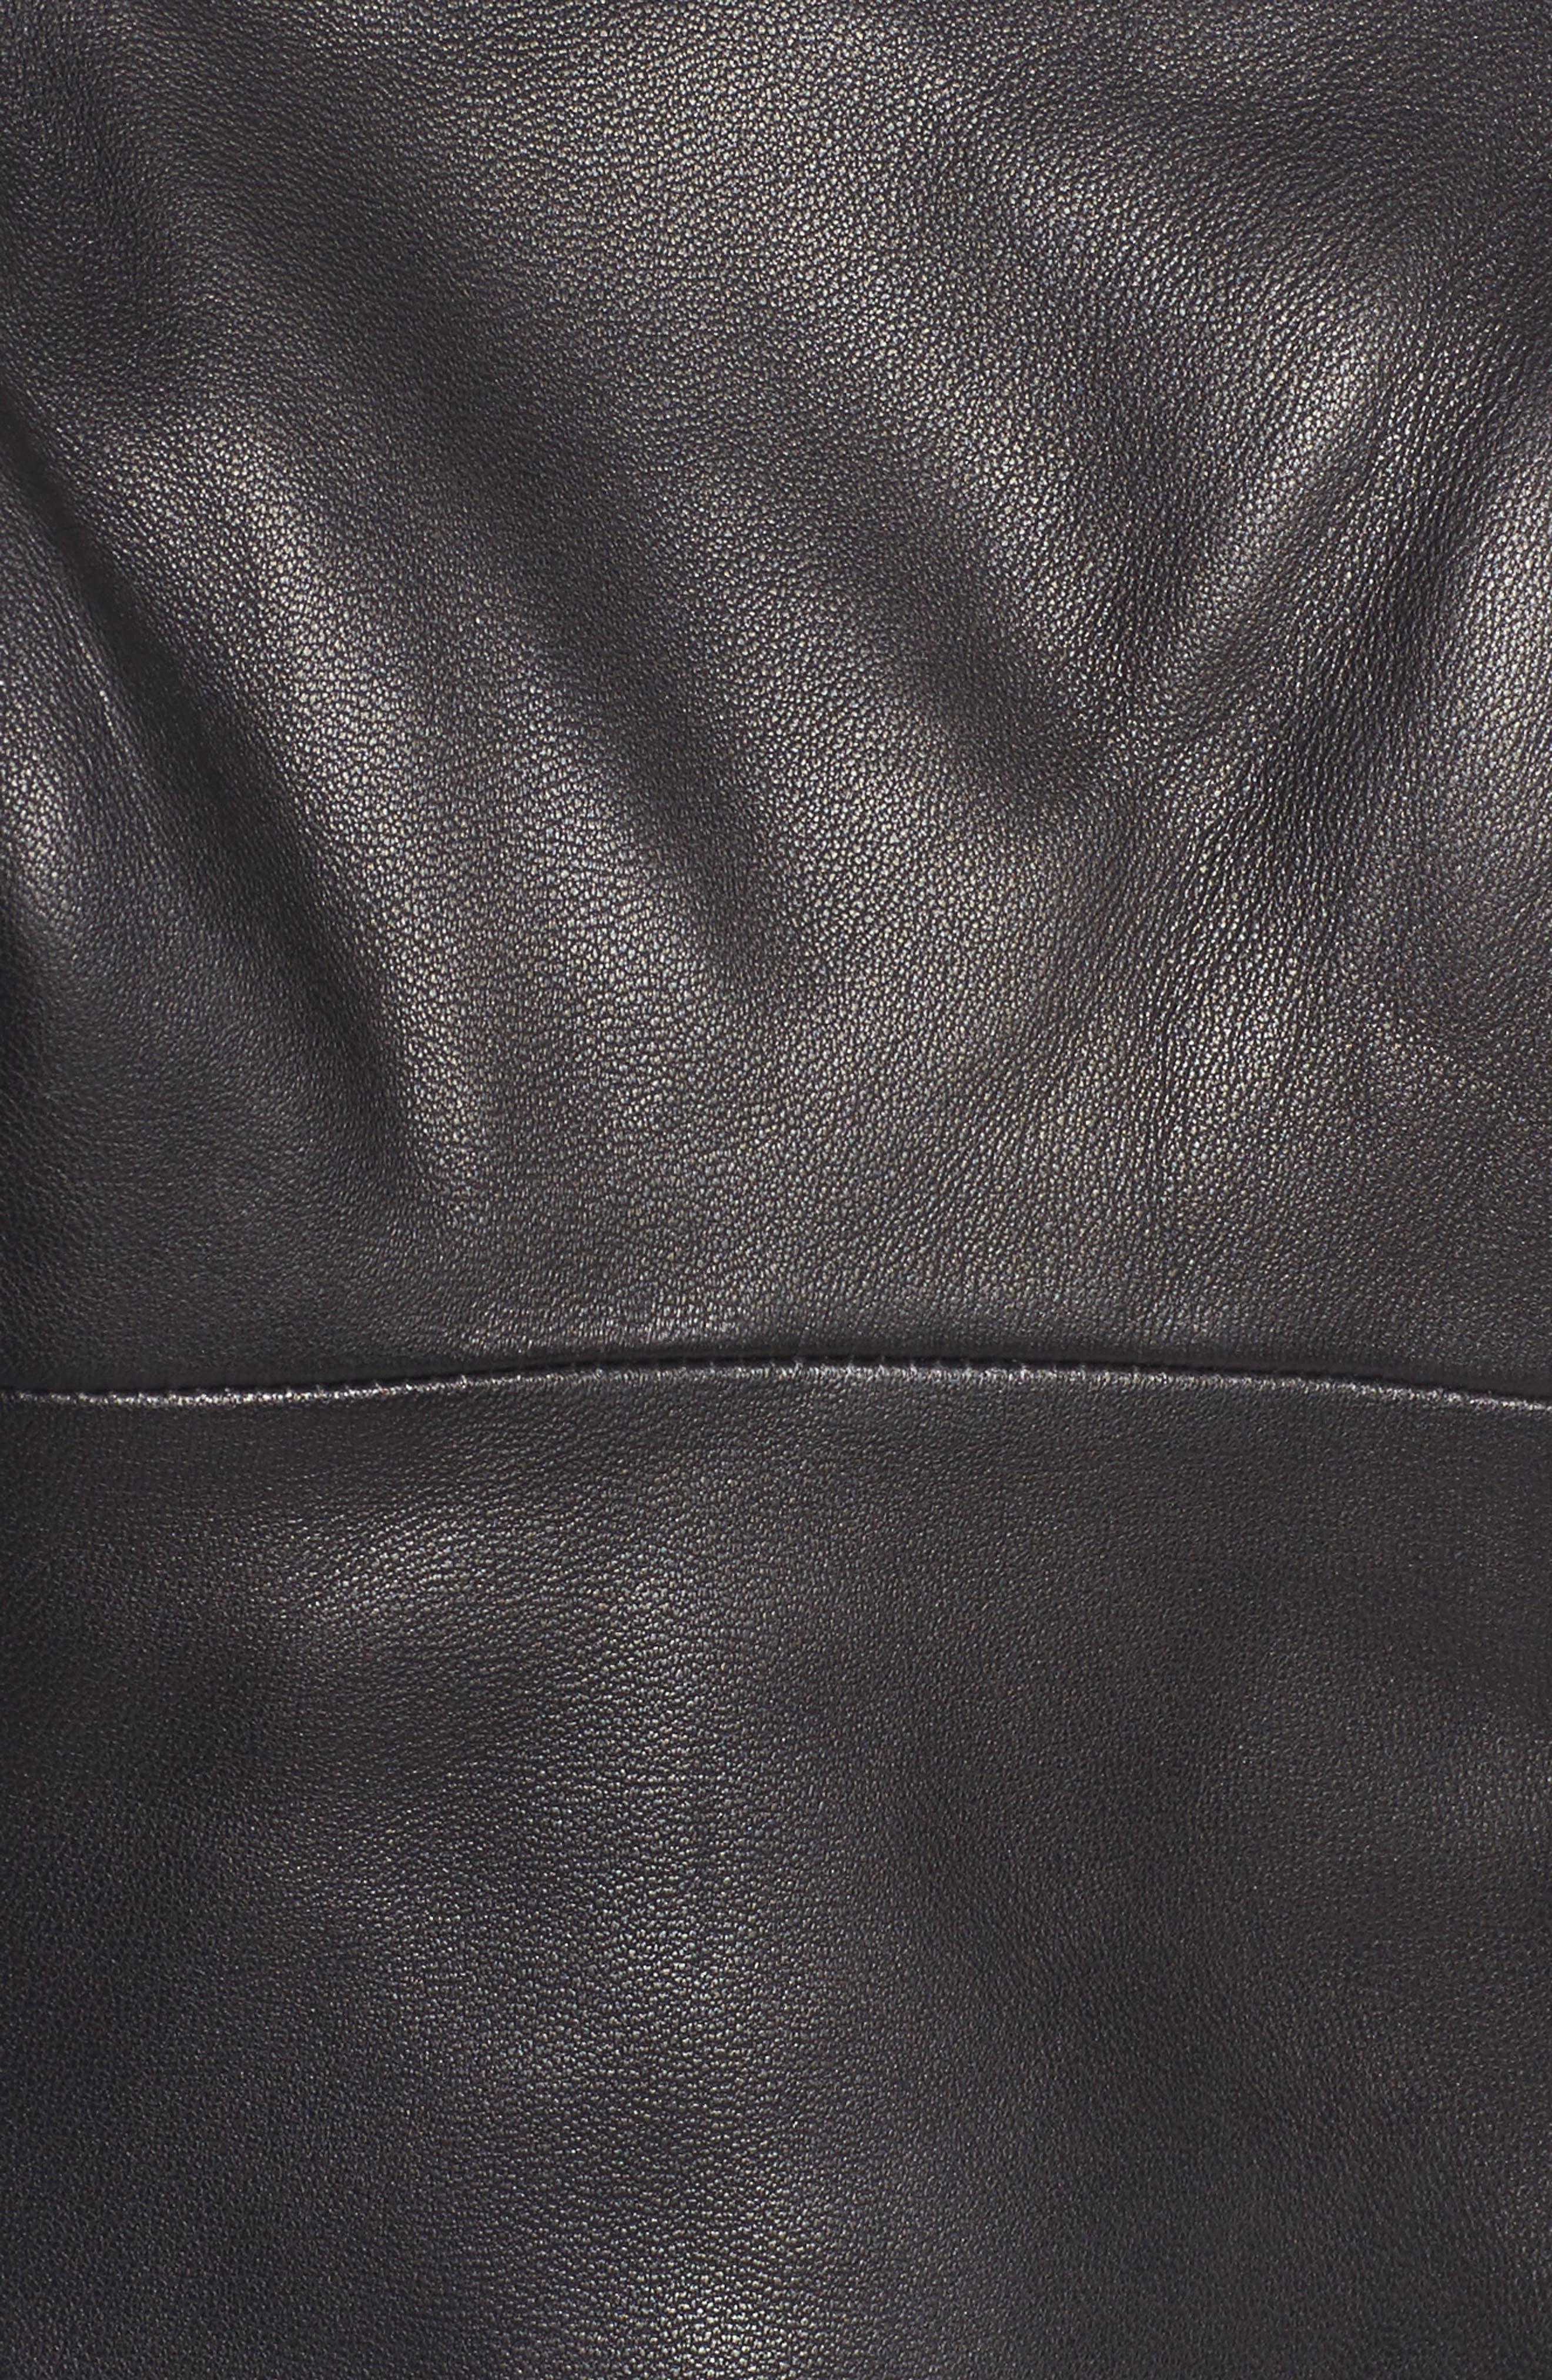 Leather Bustier,                             Alternate thumbnail 6, color,                             Black